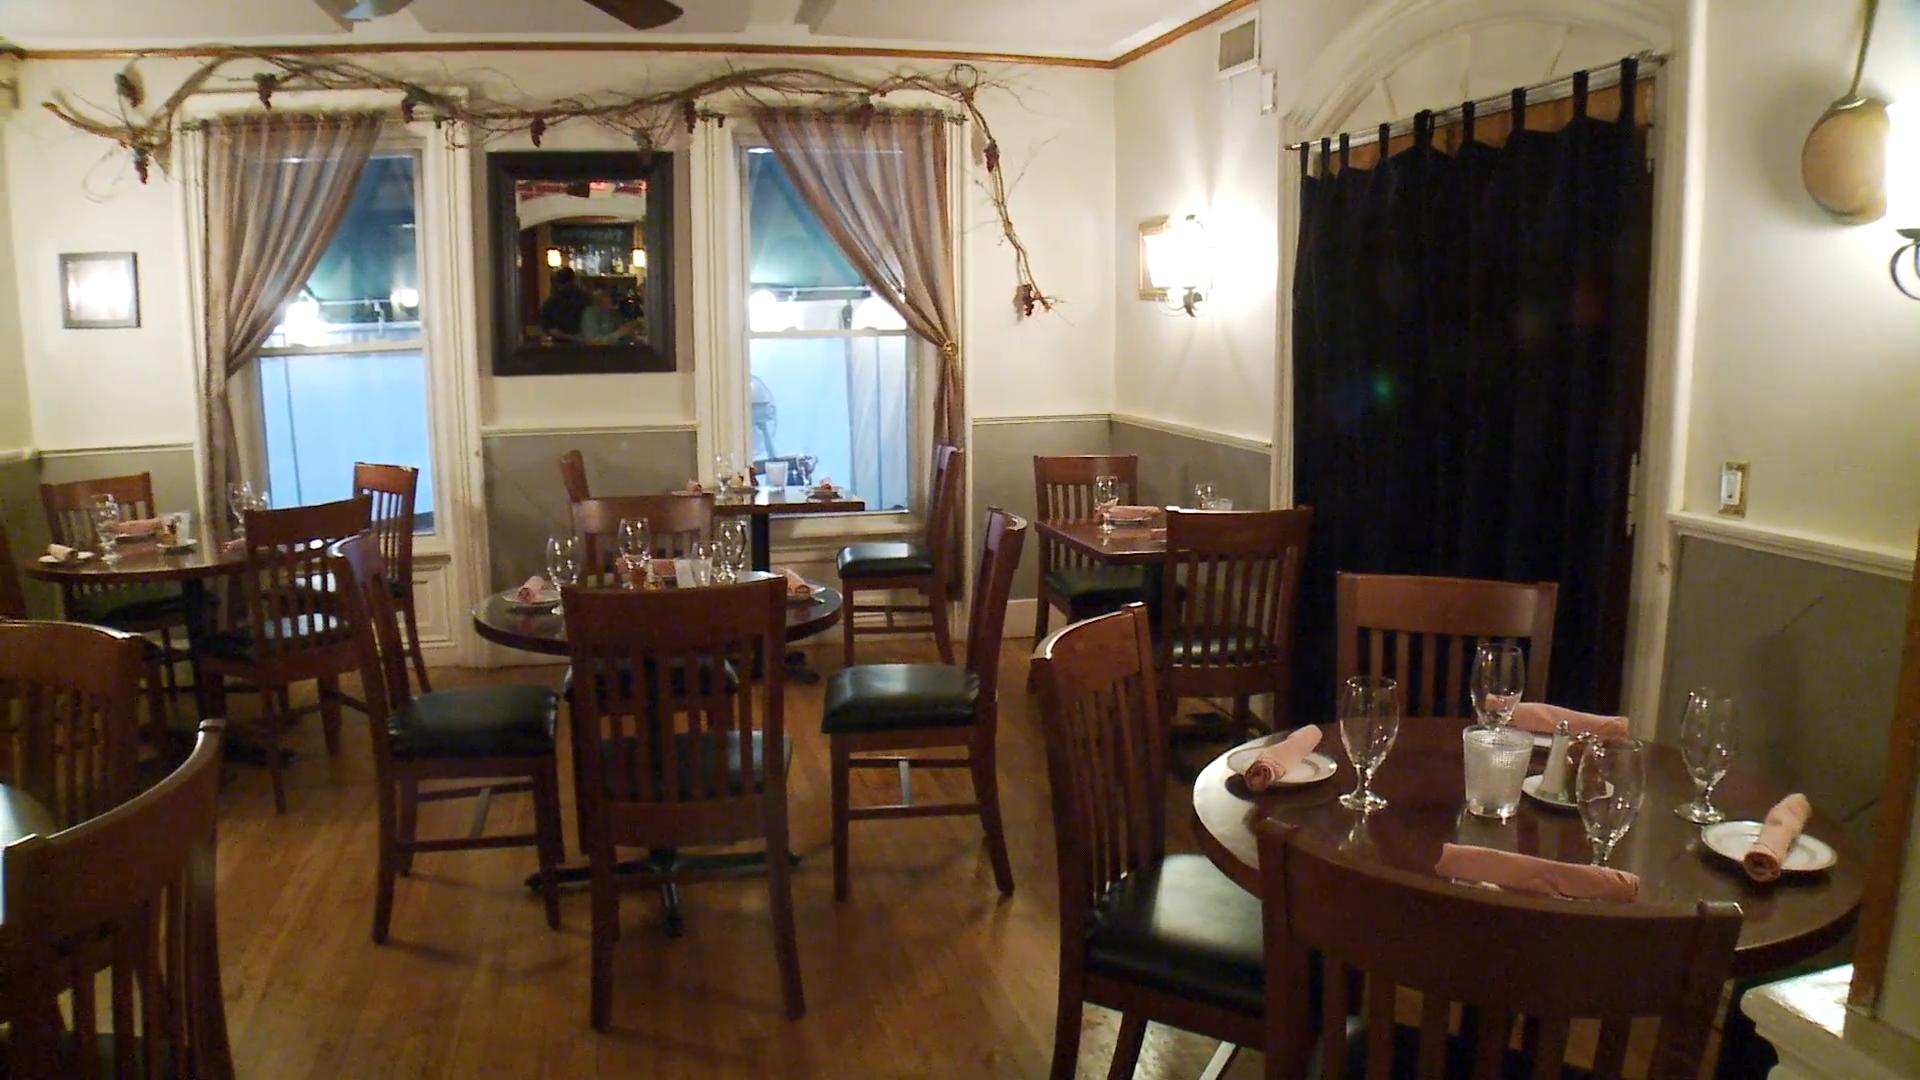 Empty Restaurant, how do you get guests inside